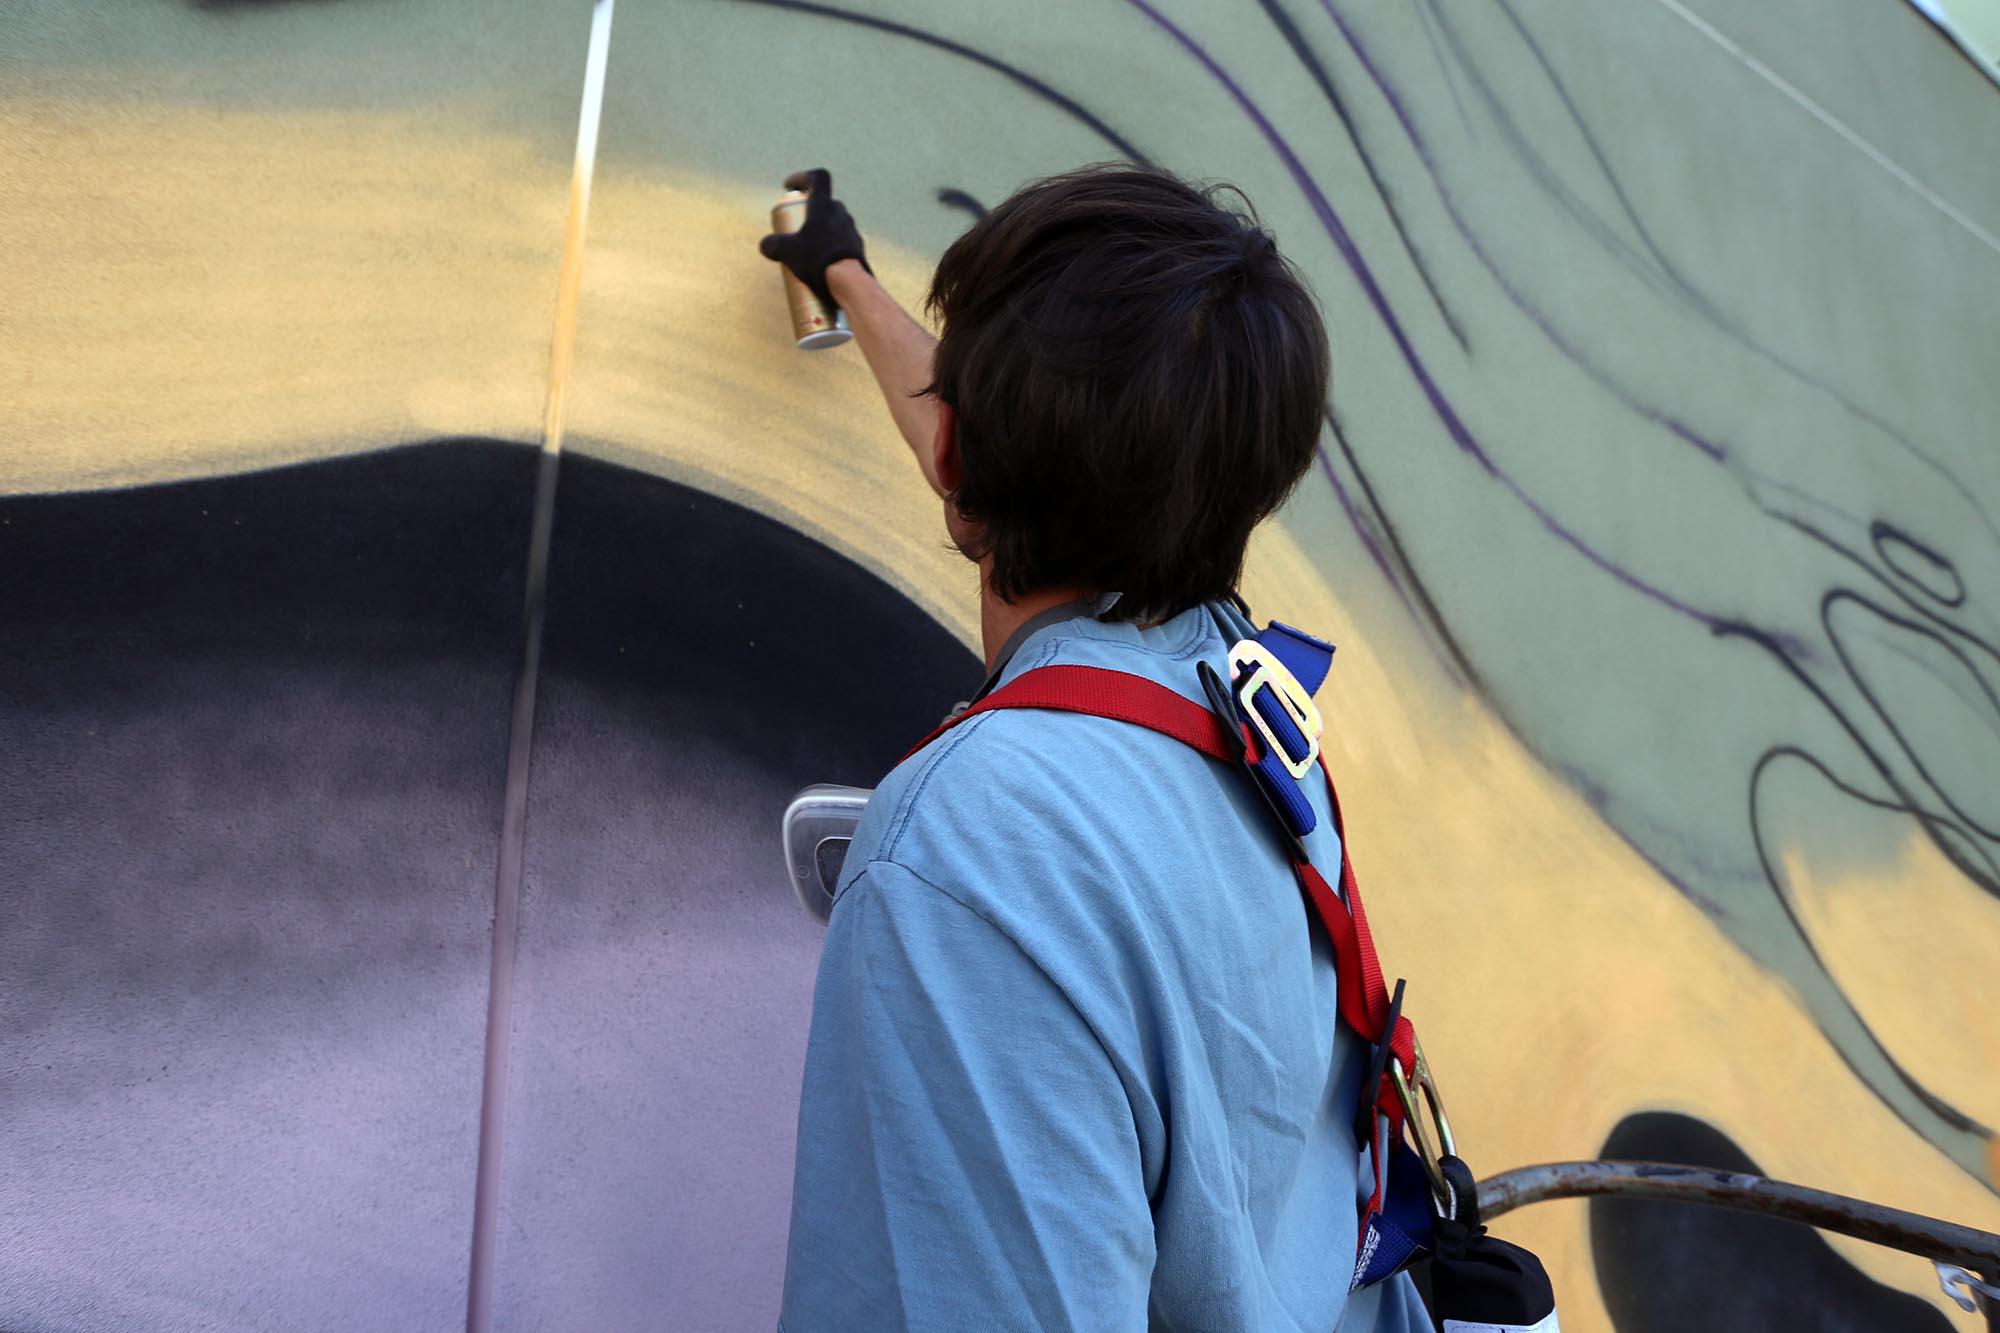 1010-festival-pow-wow-mural-grafite-dionisio-arte (8)